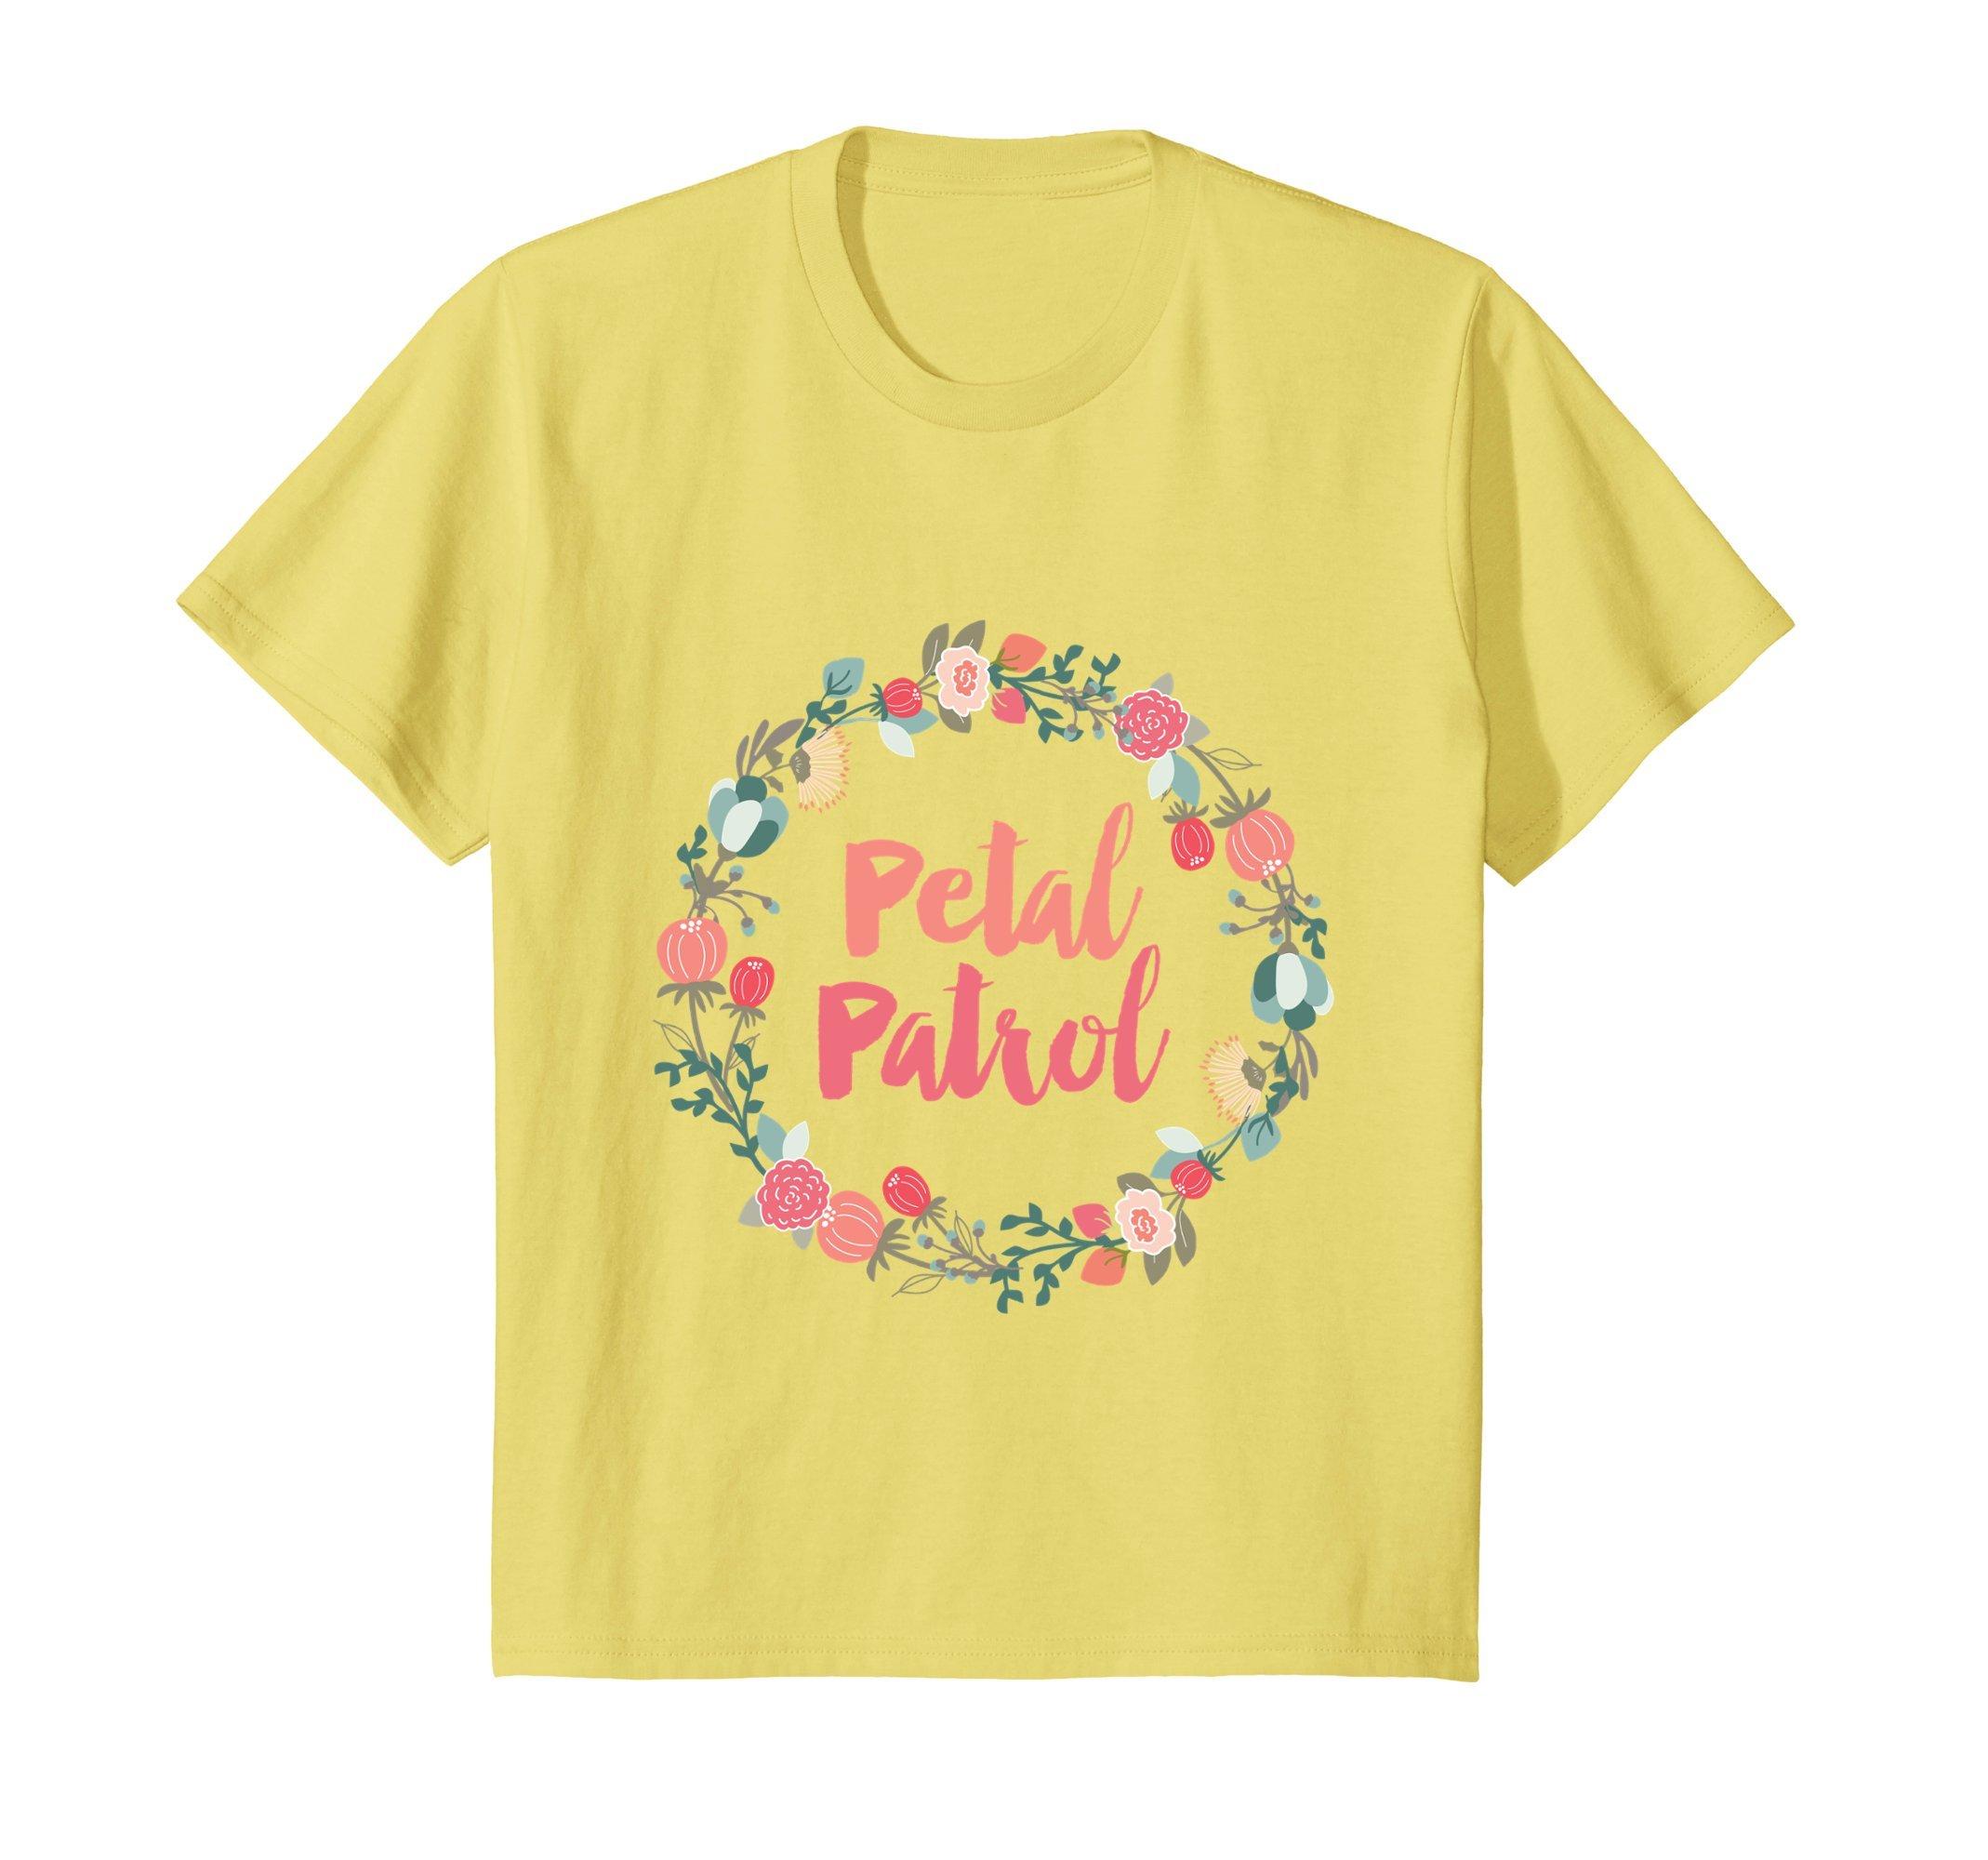 Kids Kids Petal Patrol Flower Girl Shirt, Cute Wedding Shirts 4 Lemon